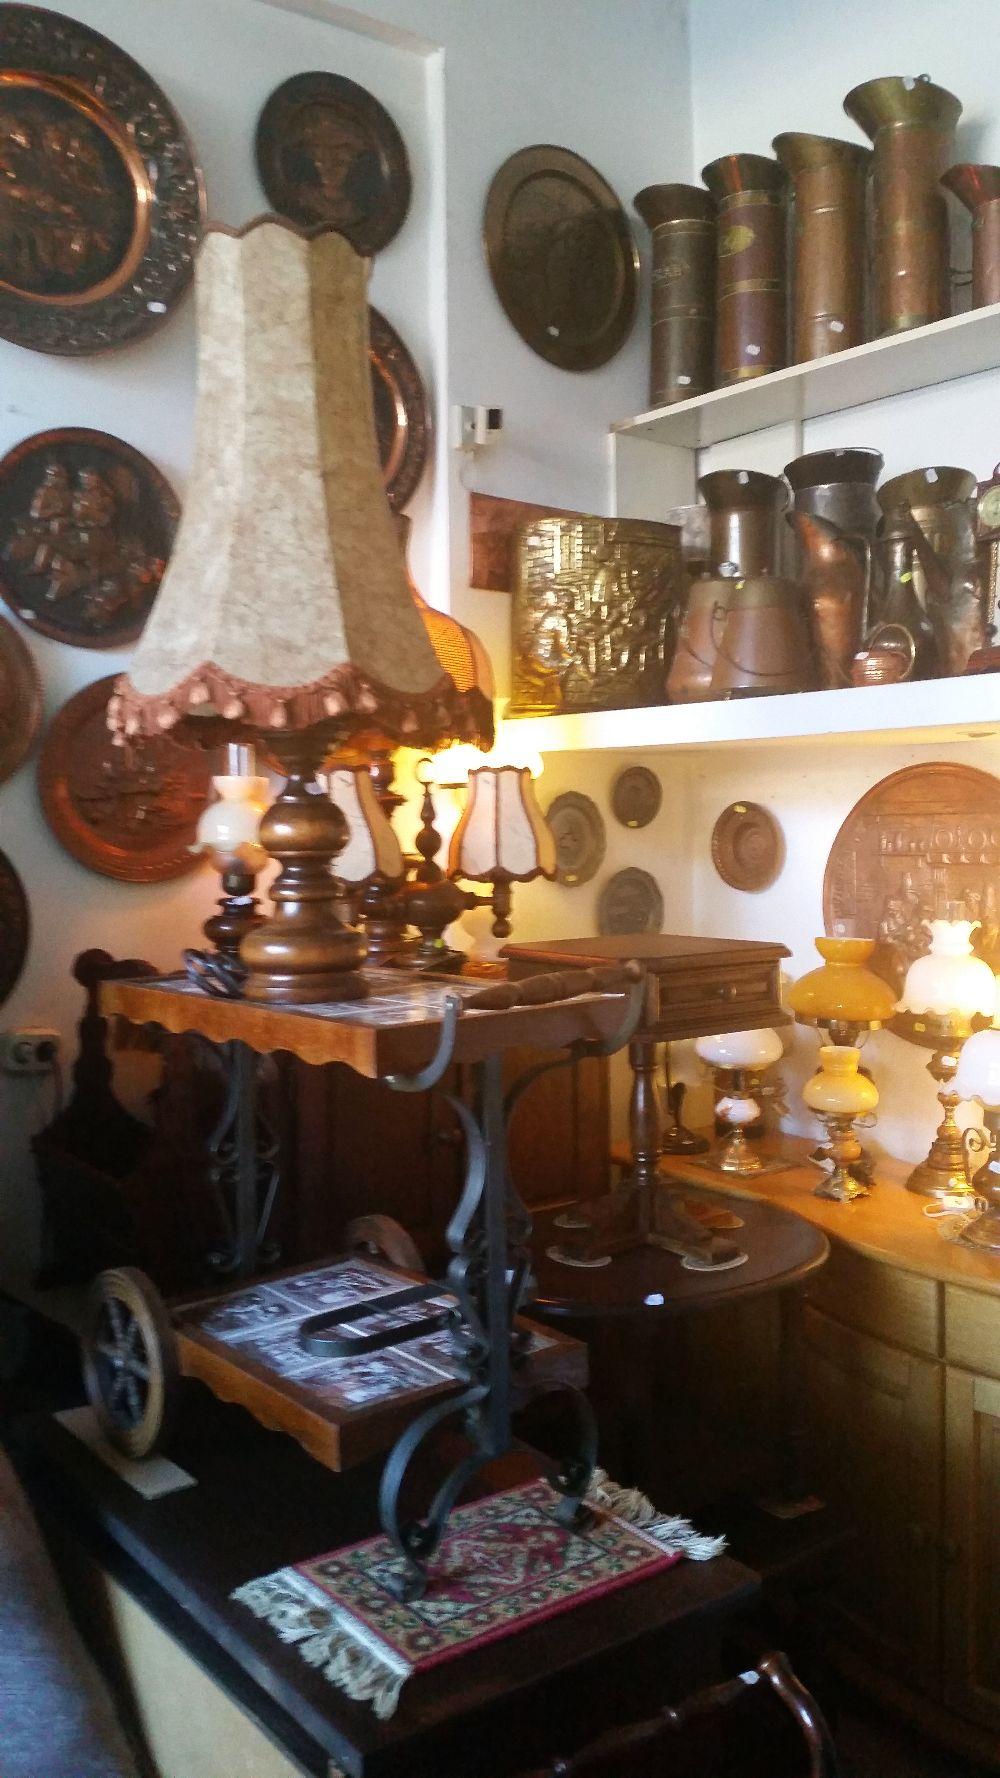 adelaparvu.com despre magazin de mobila si obiecte decorative, magazin antichitati, Leda Decor Bucuresti (20)